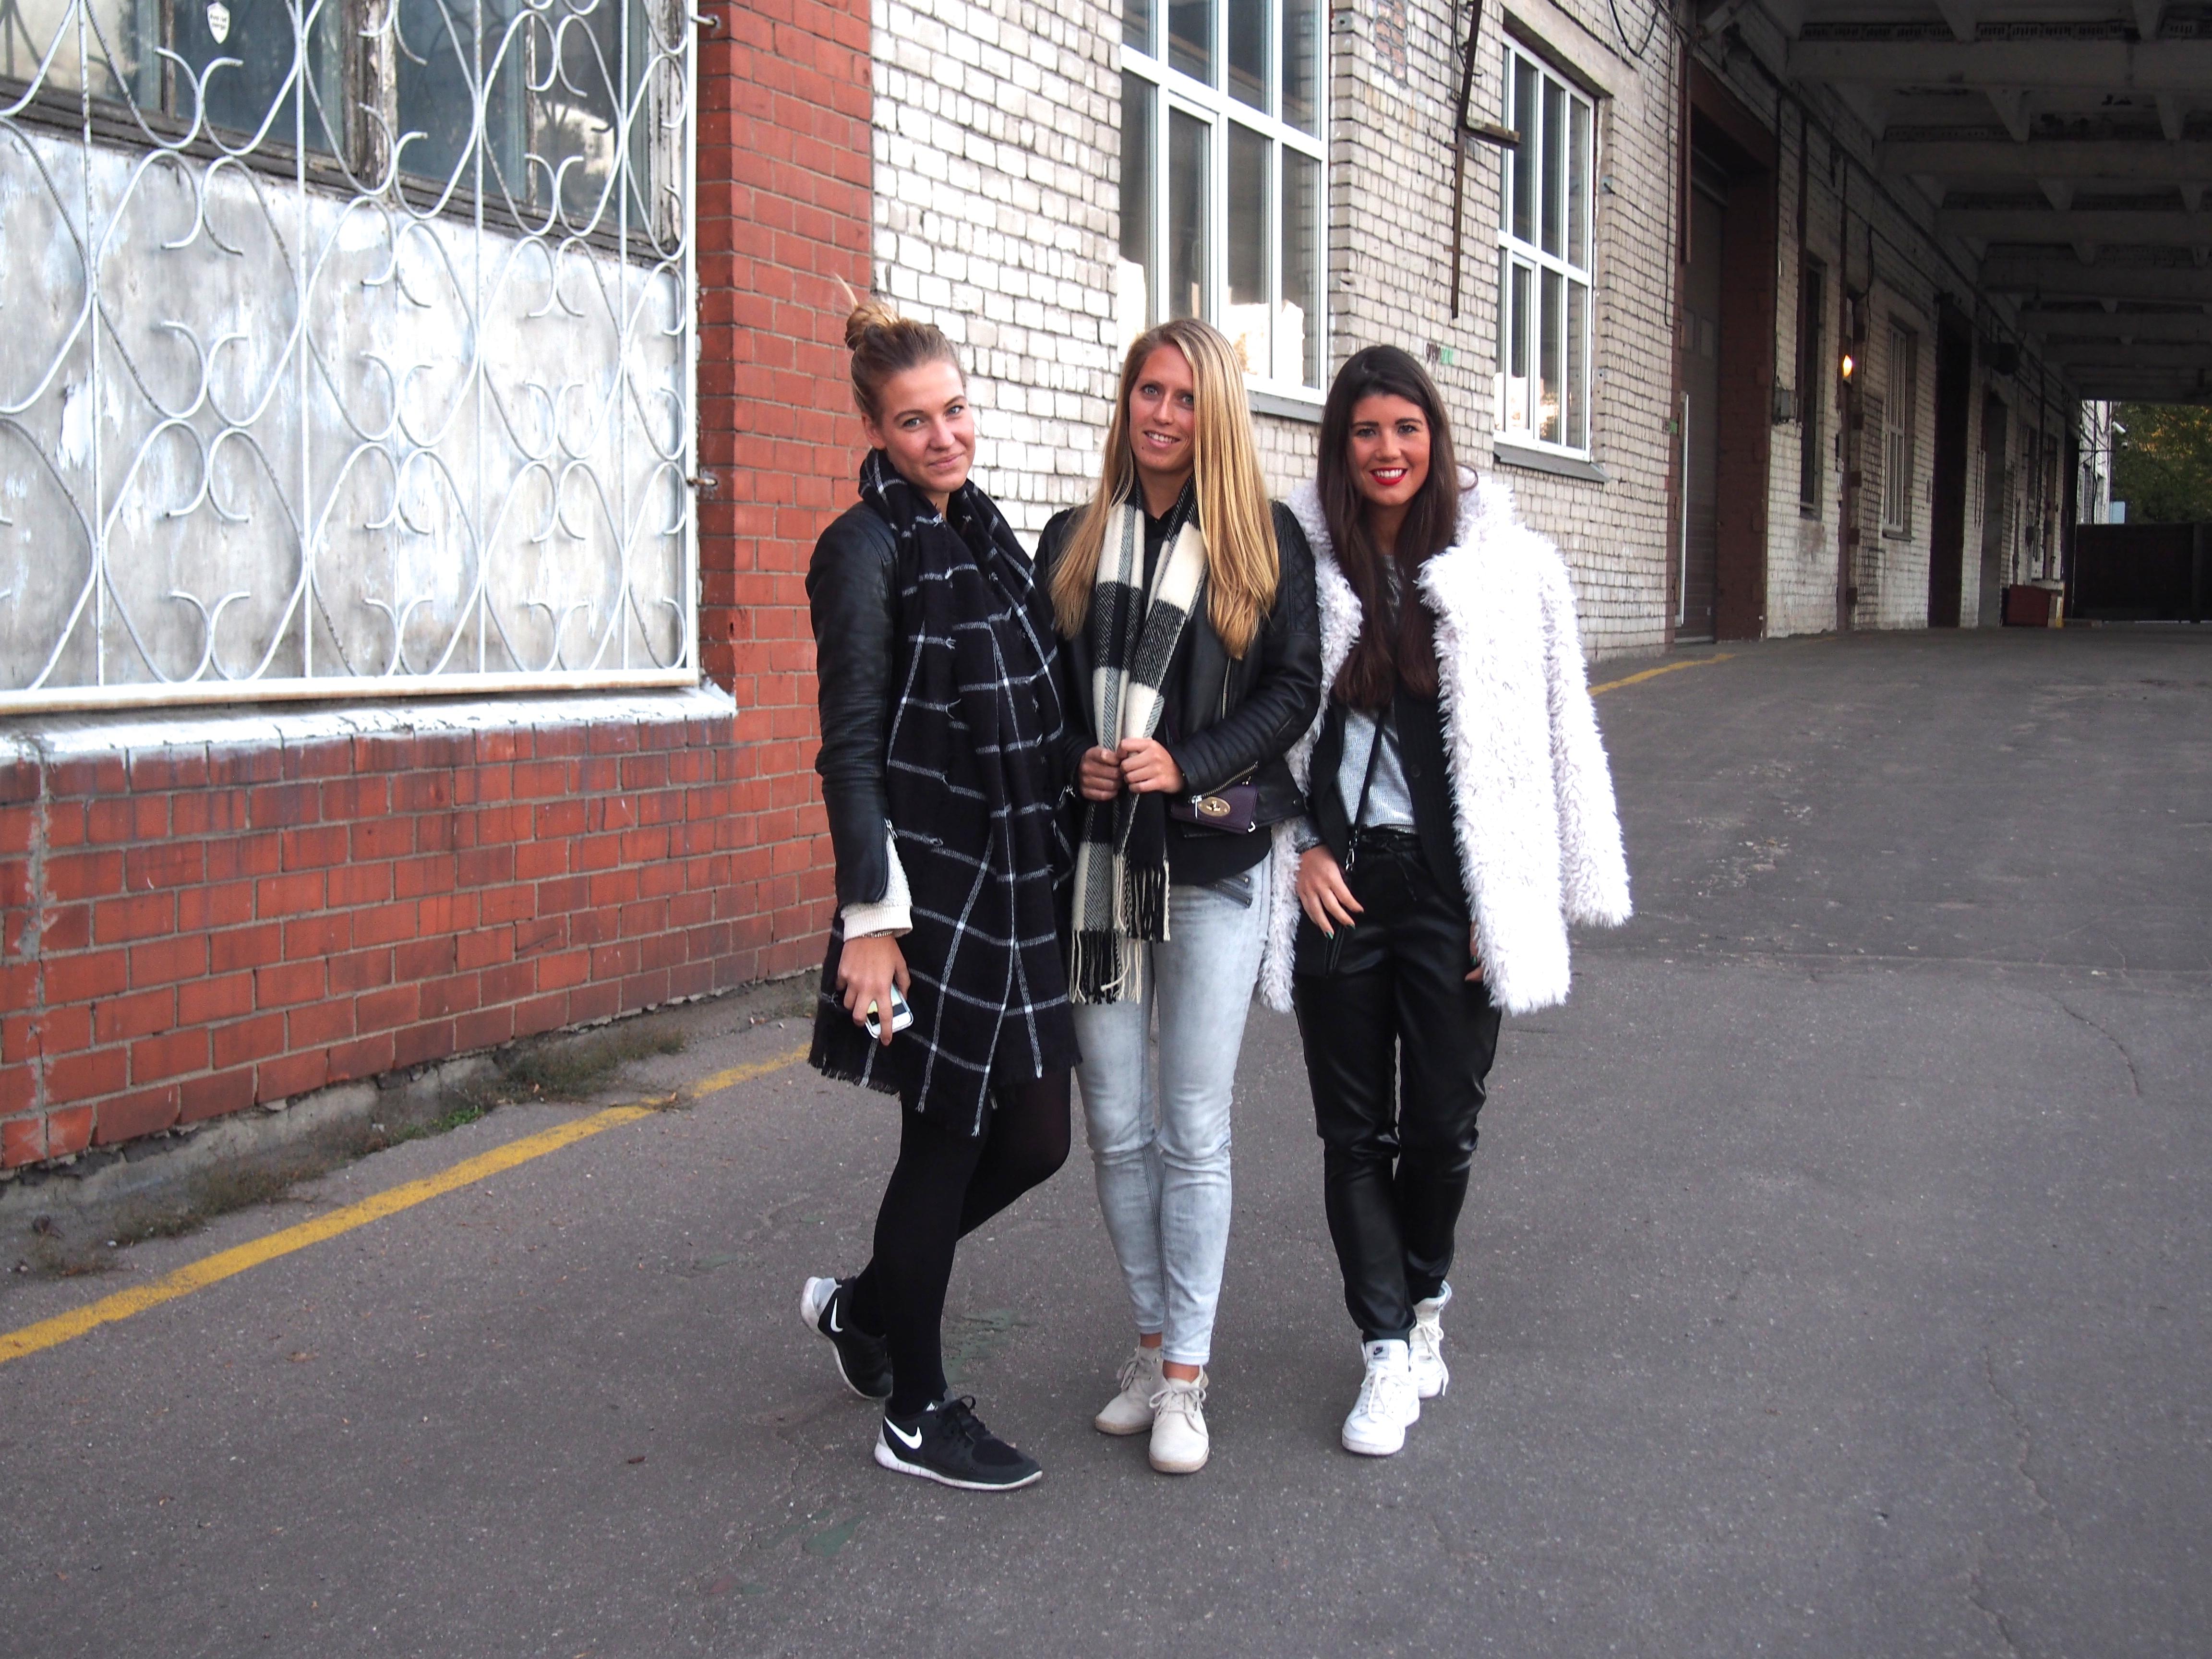 Aqua Luna Riga Latvia with Marloes and Annemerel